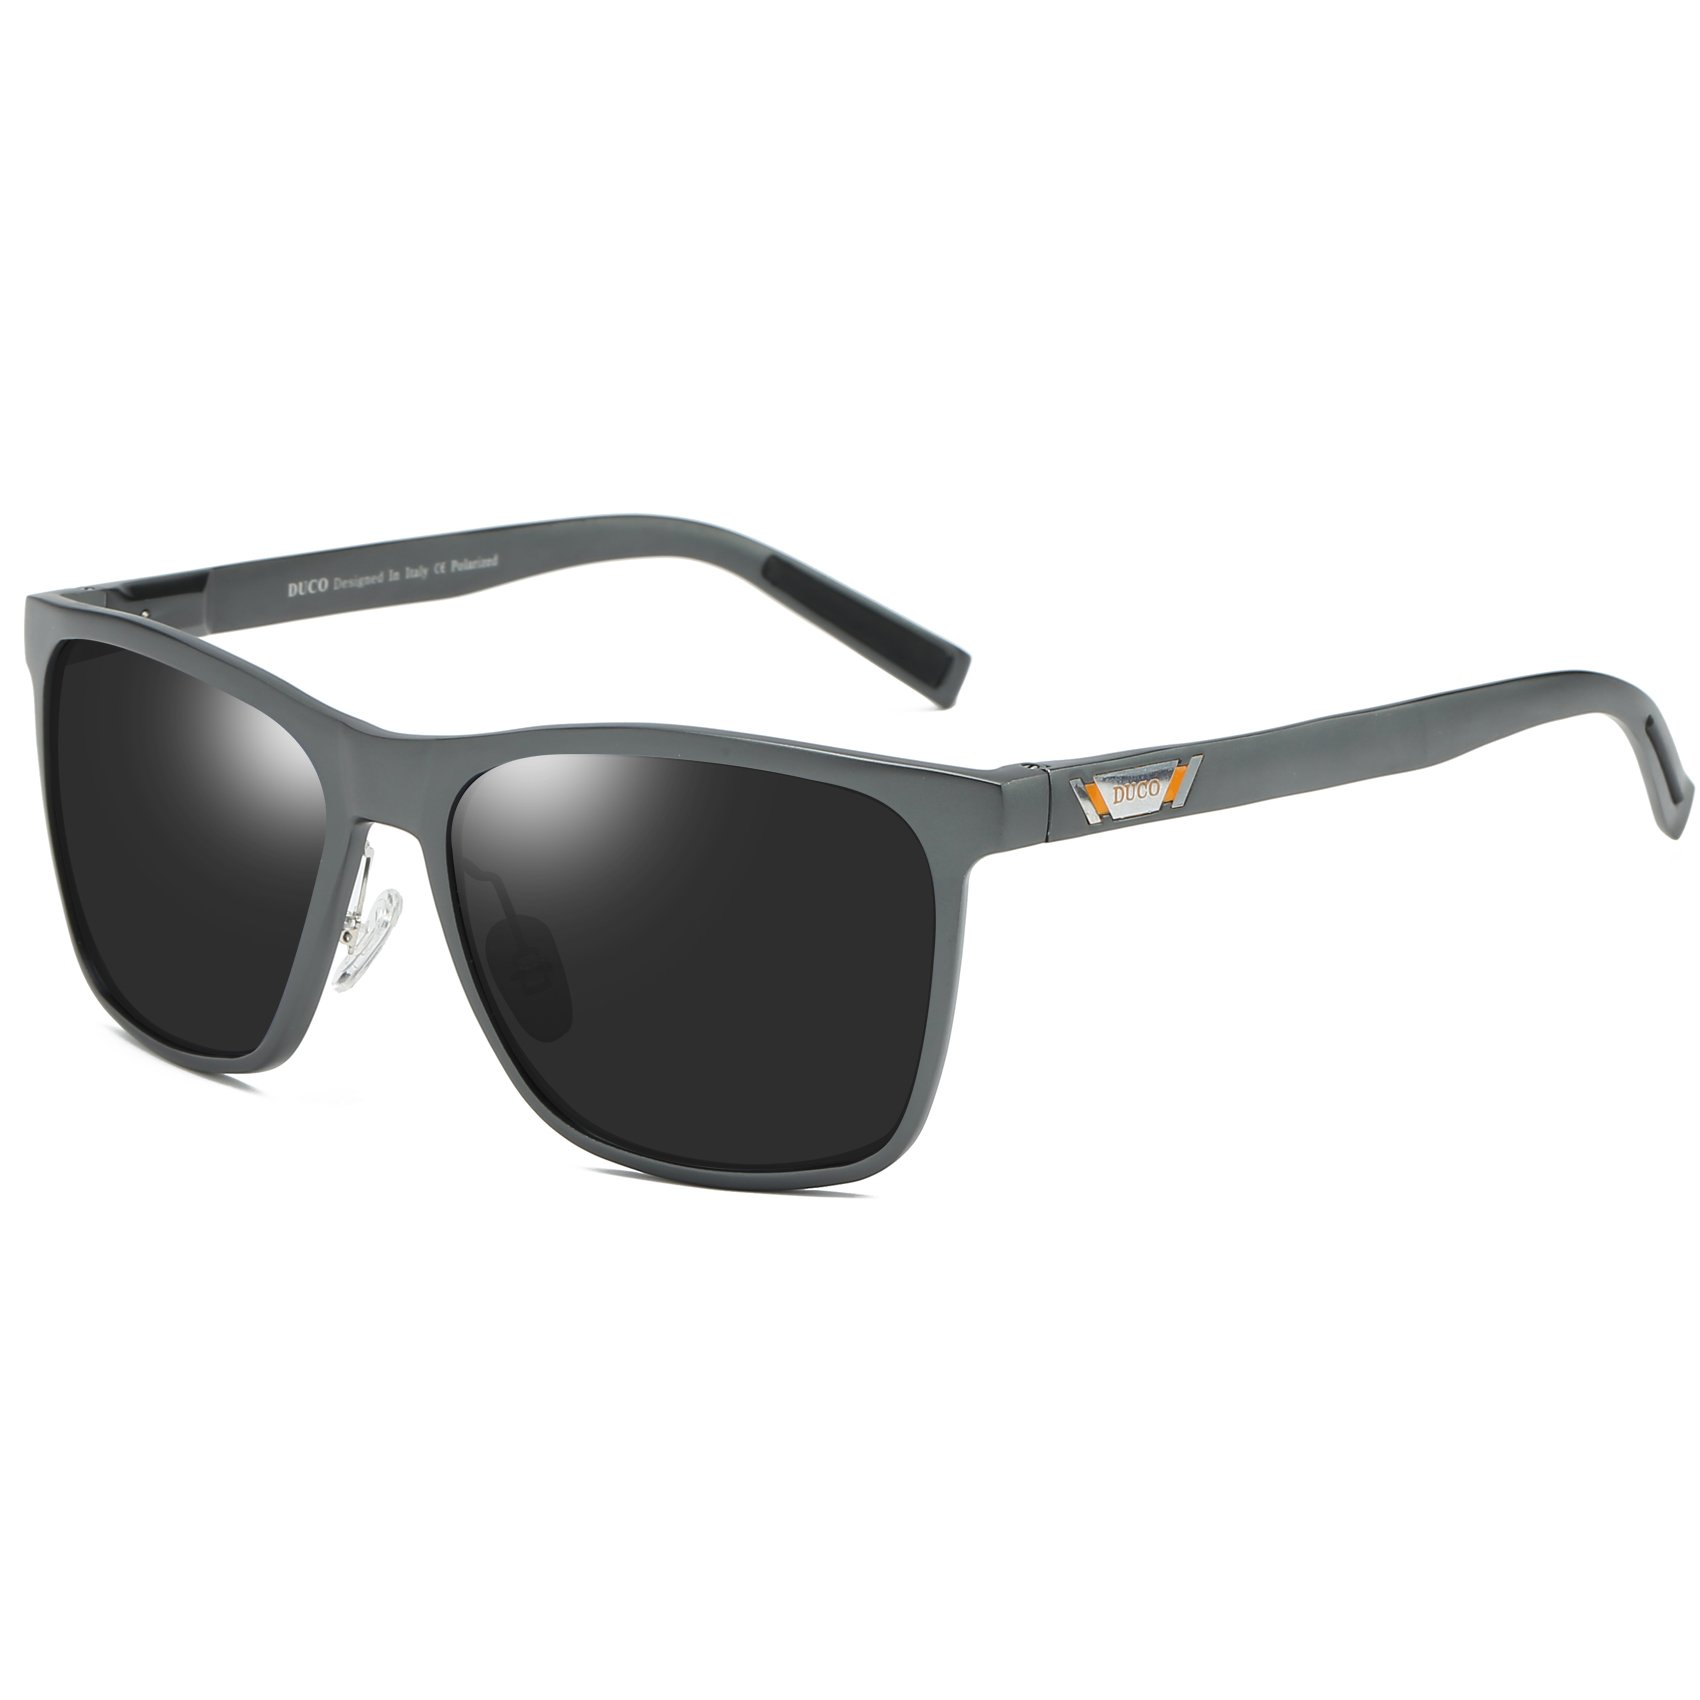 Solbriller Polariseret